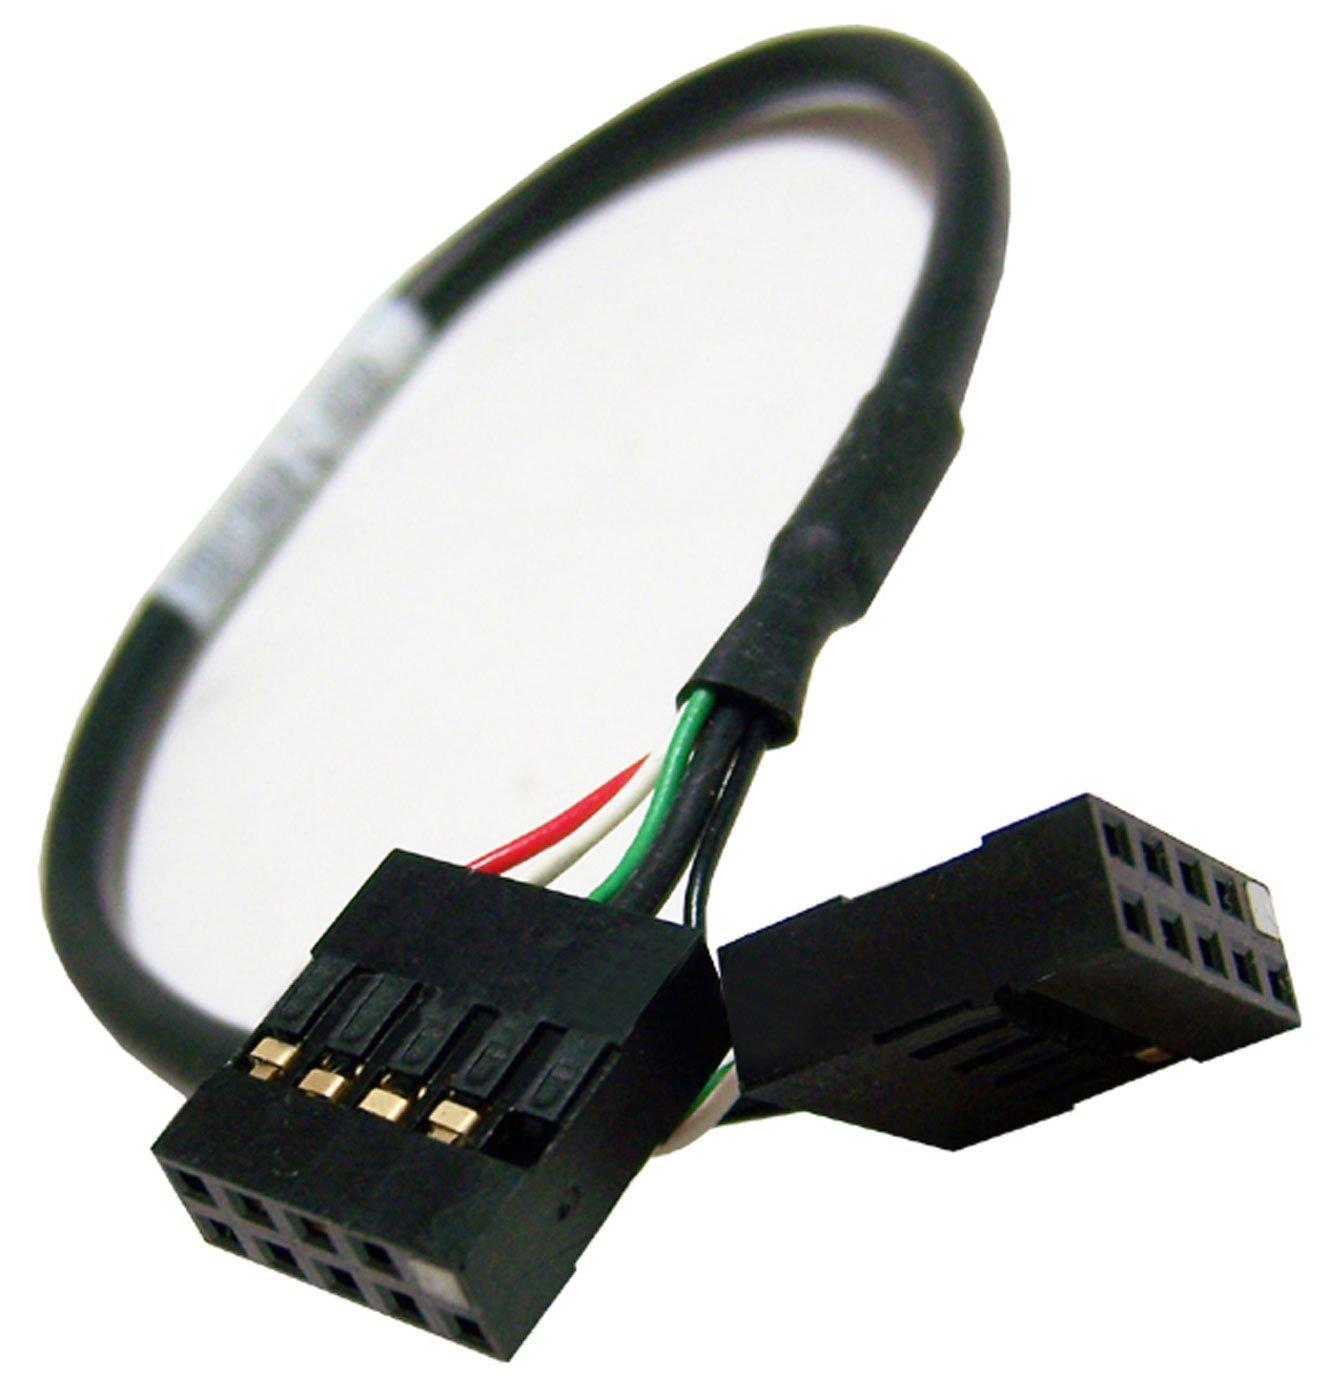 HP Dash Nic Card Internal Cable